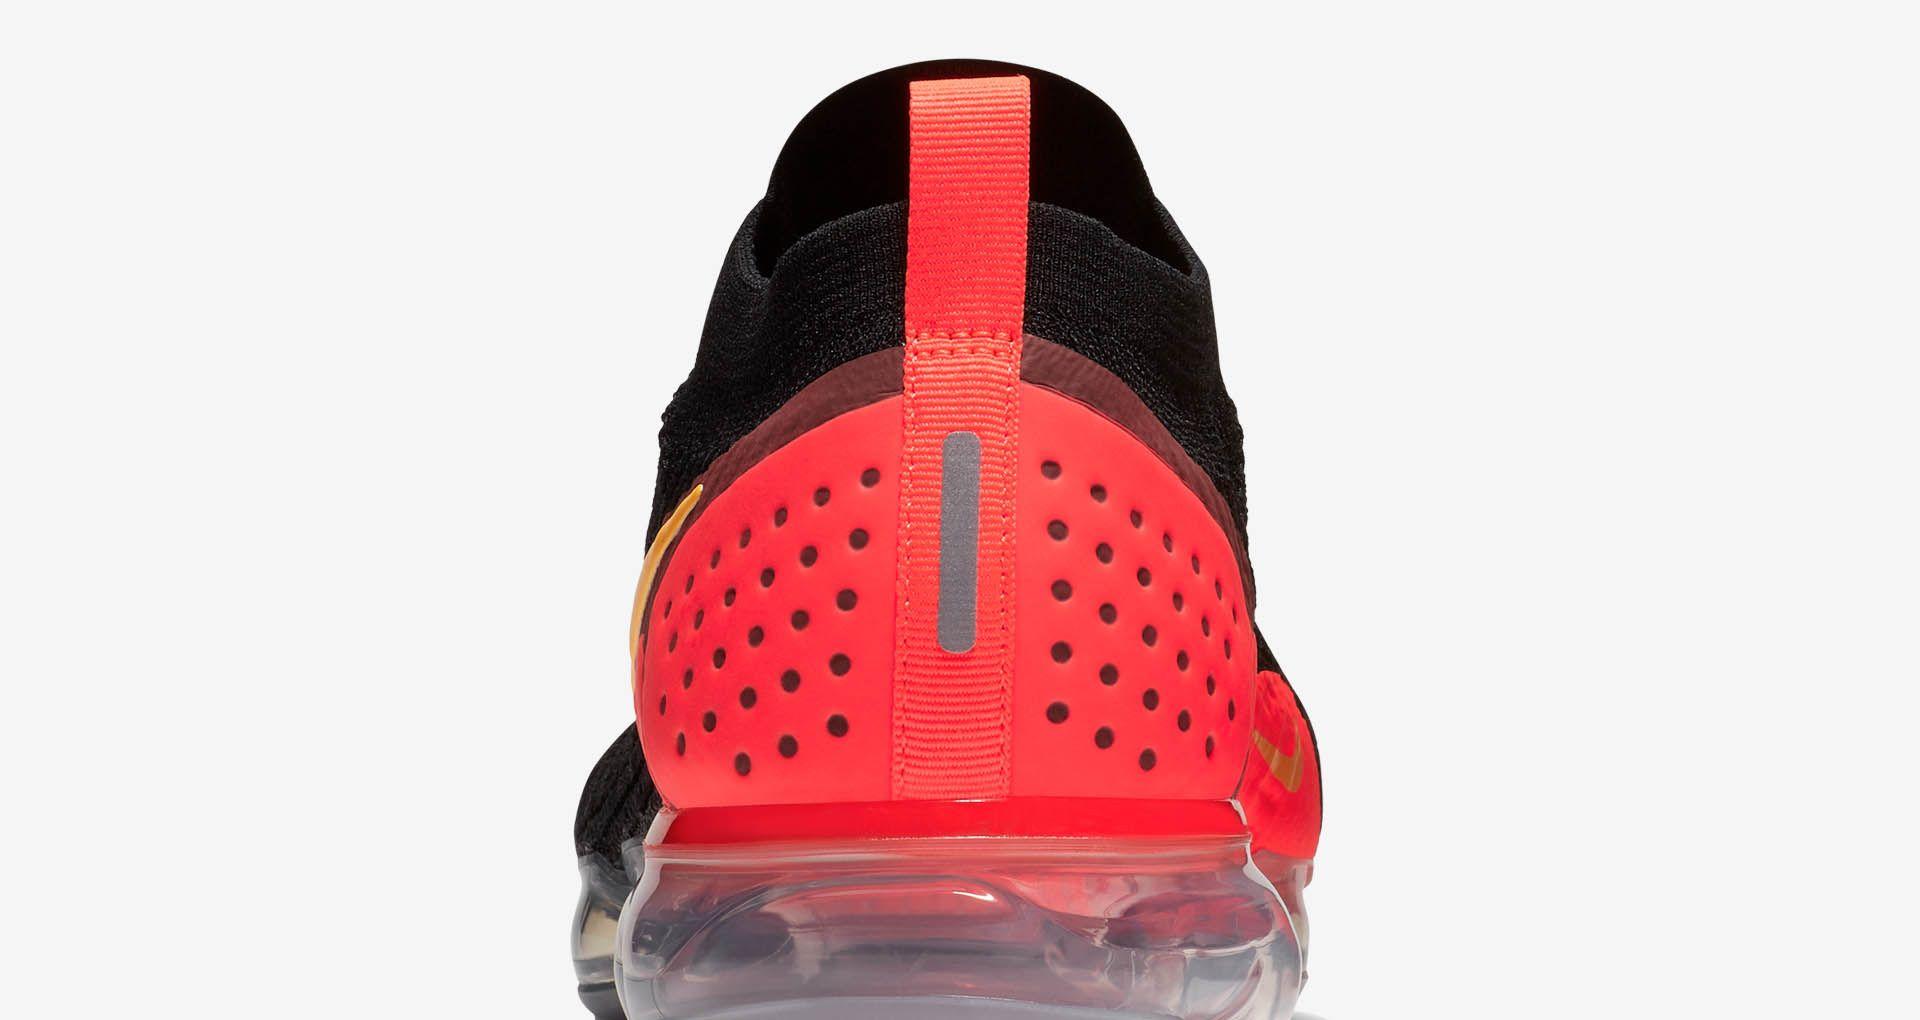 382366a740eea Nike Air Vapormax 2  Black   Laser Orange  Release Date. Nike+ SNKRS